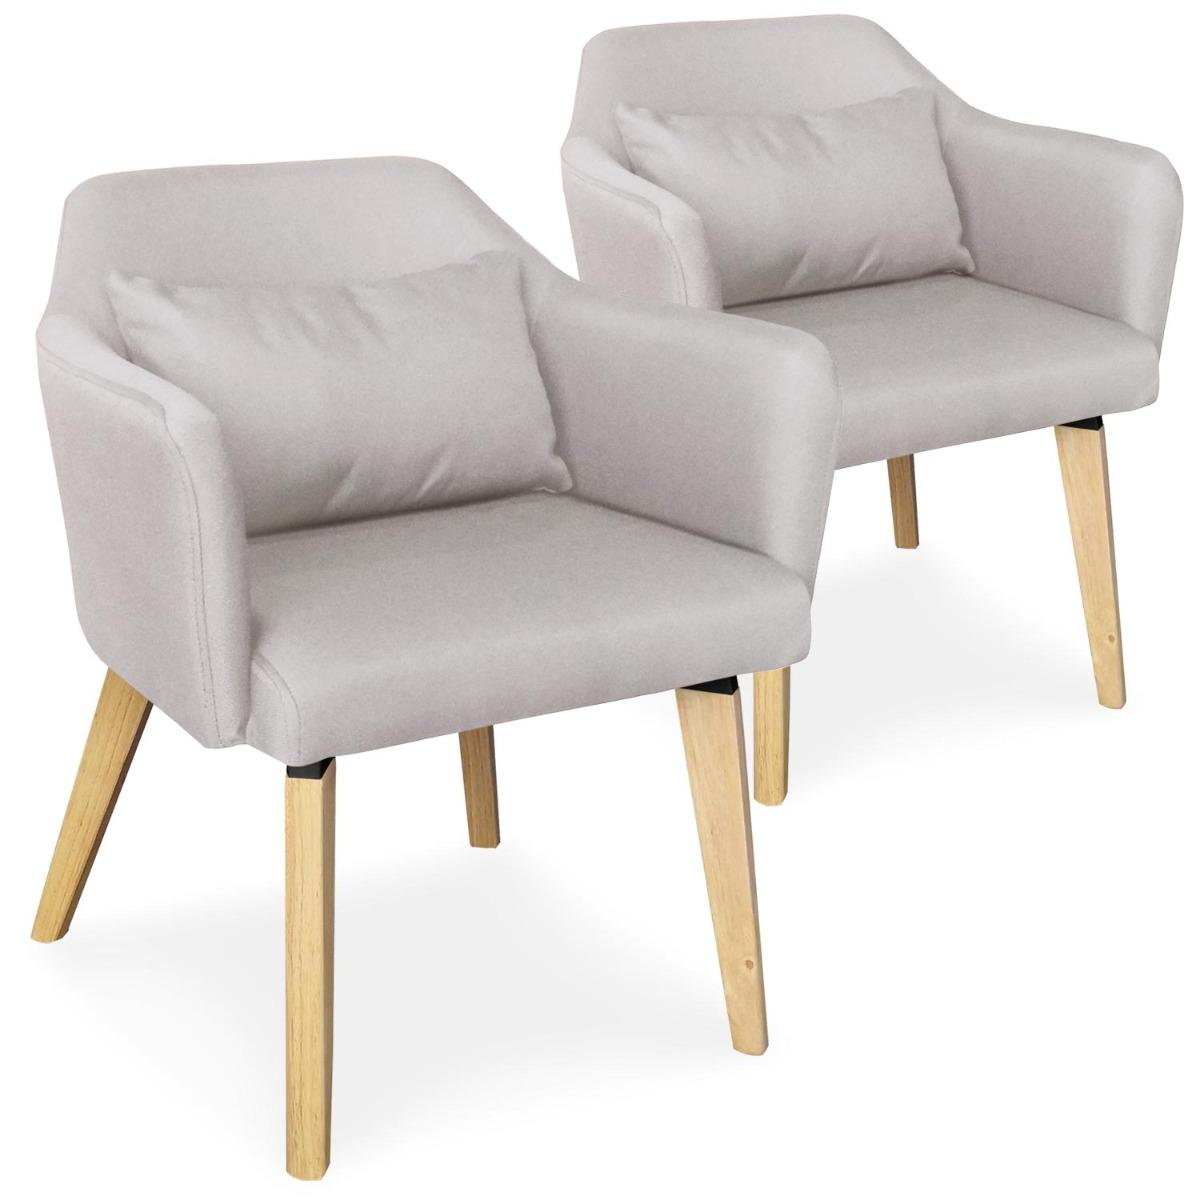 Lot de 2 chaises / fauteuils scandinaves Shaggy Tissu Beige